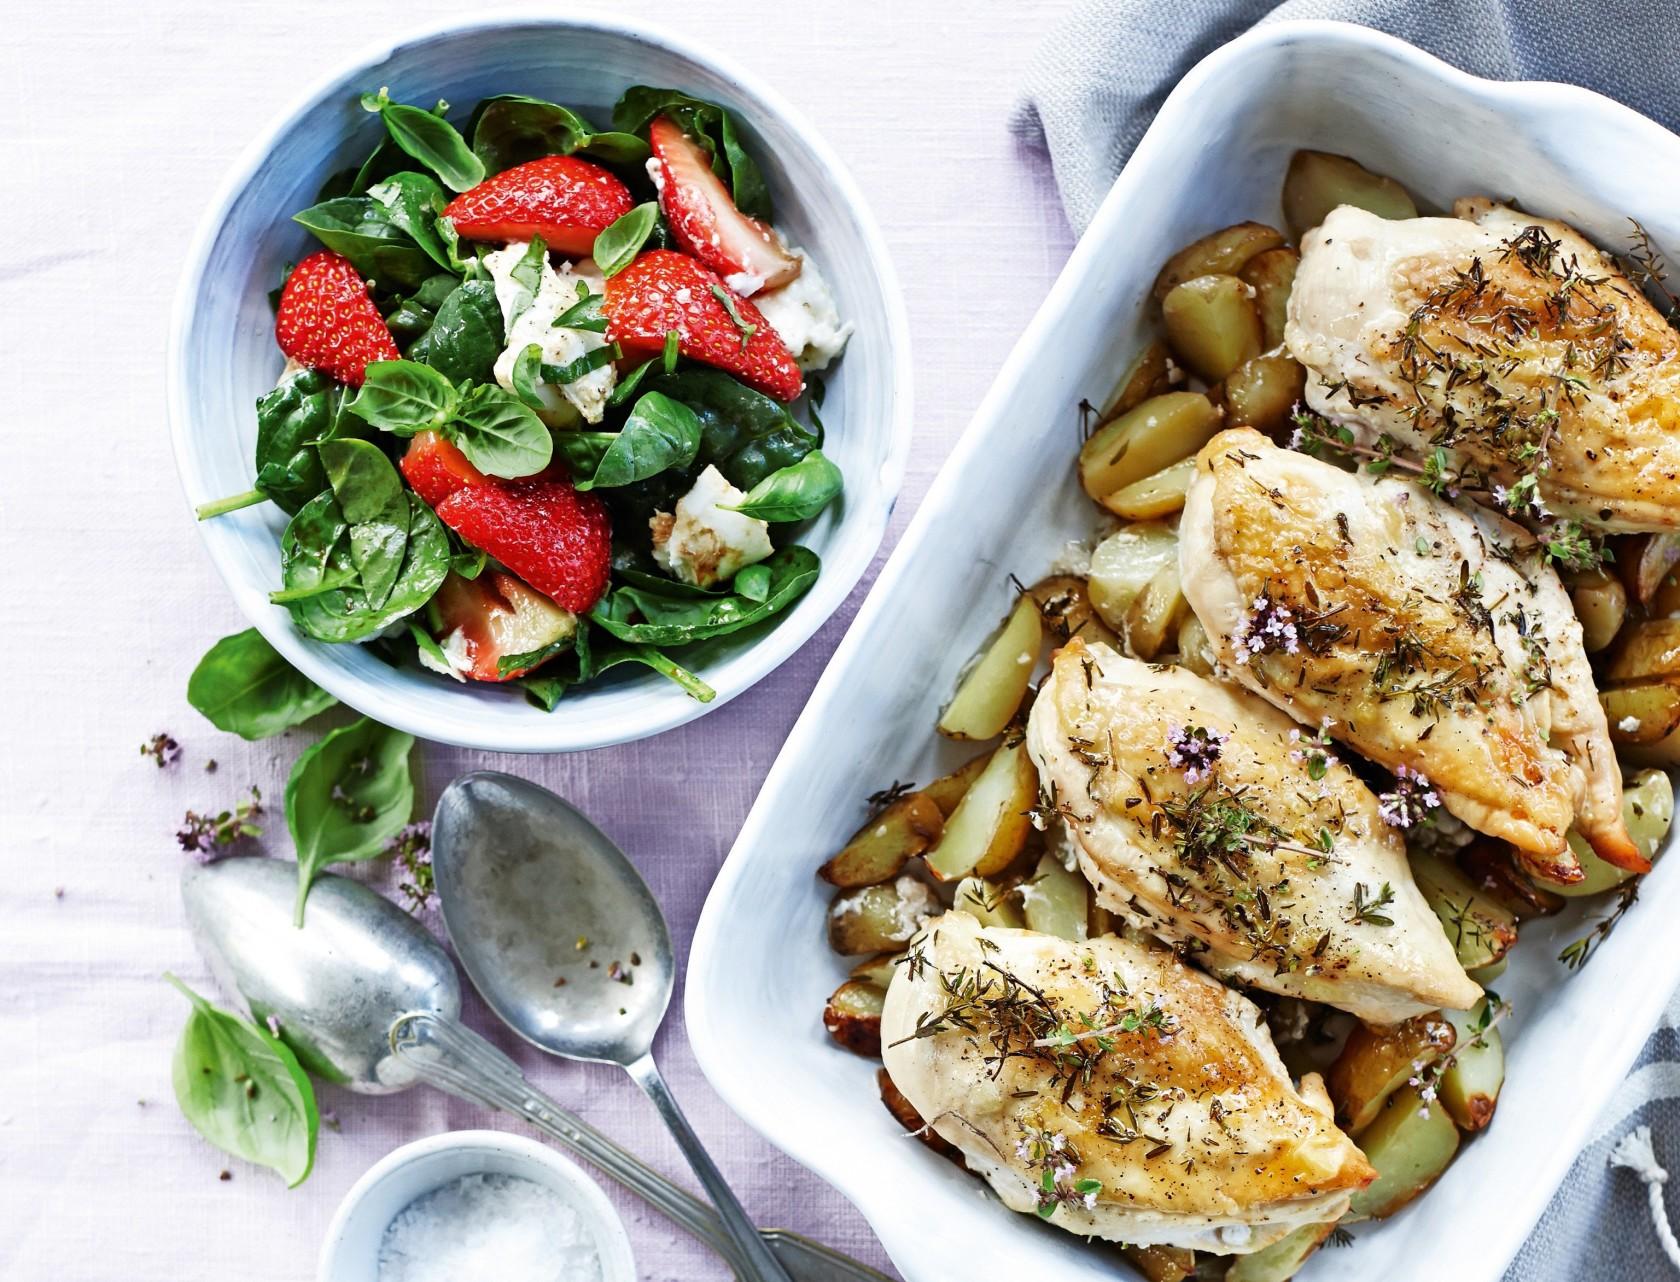 Timiankylling i ovn med salat